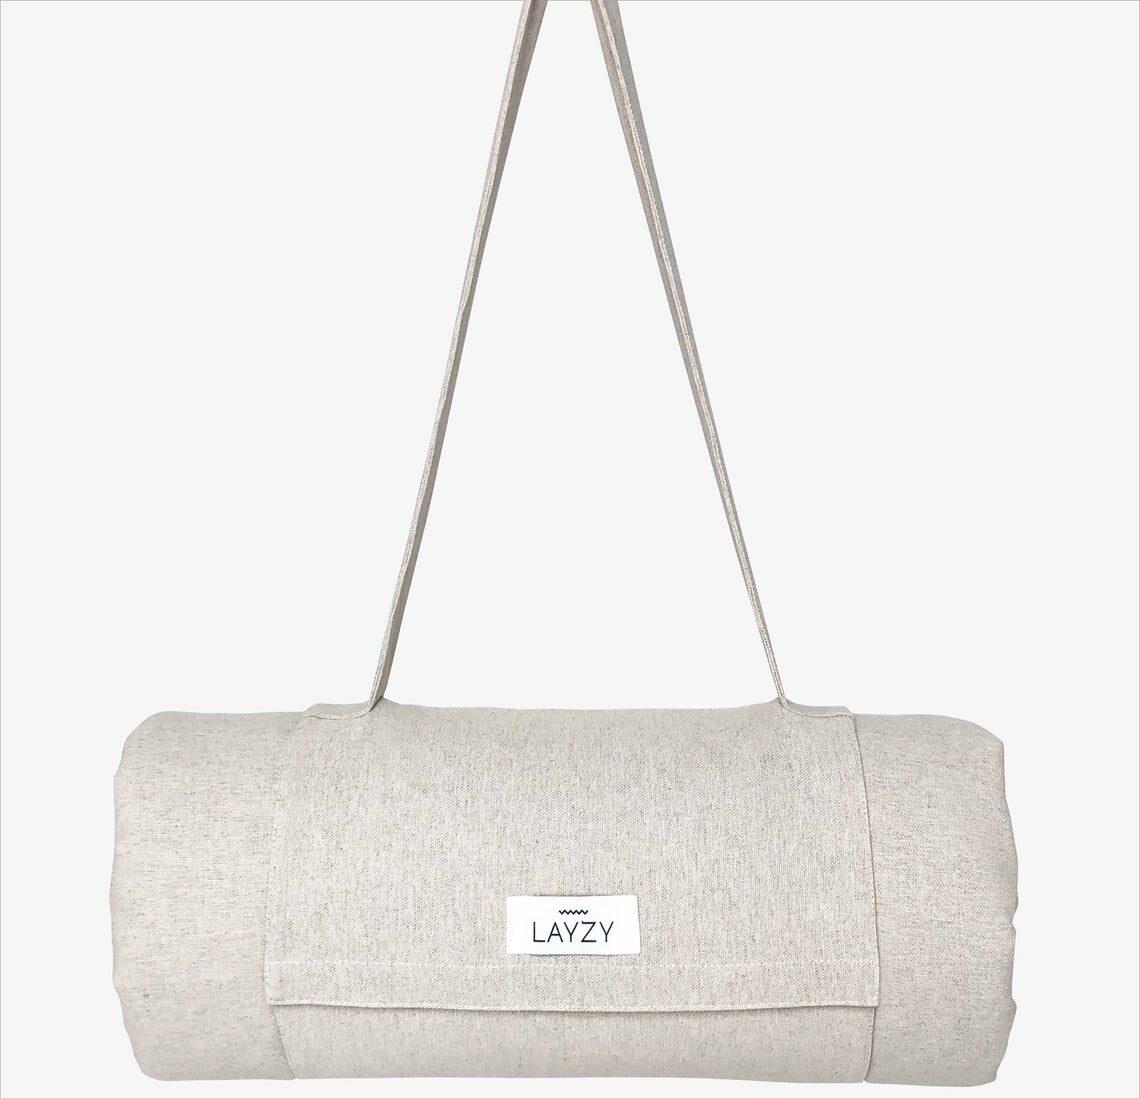 layzy-blanket